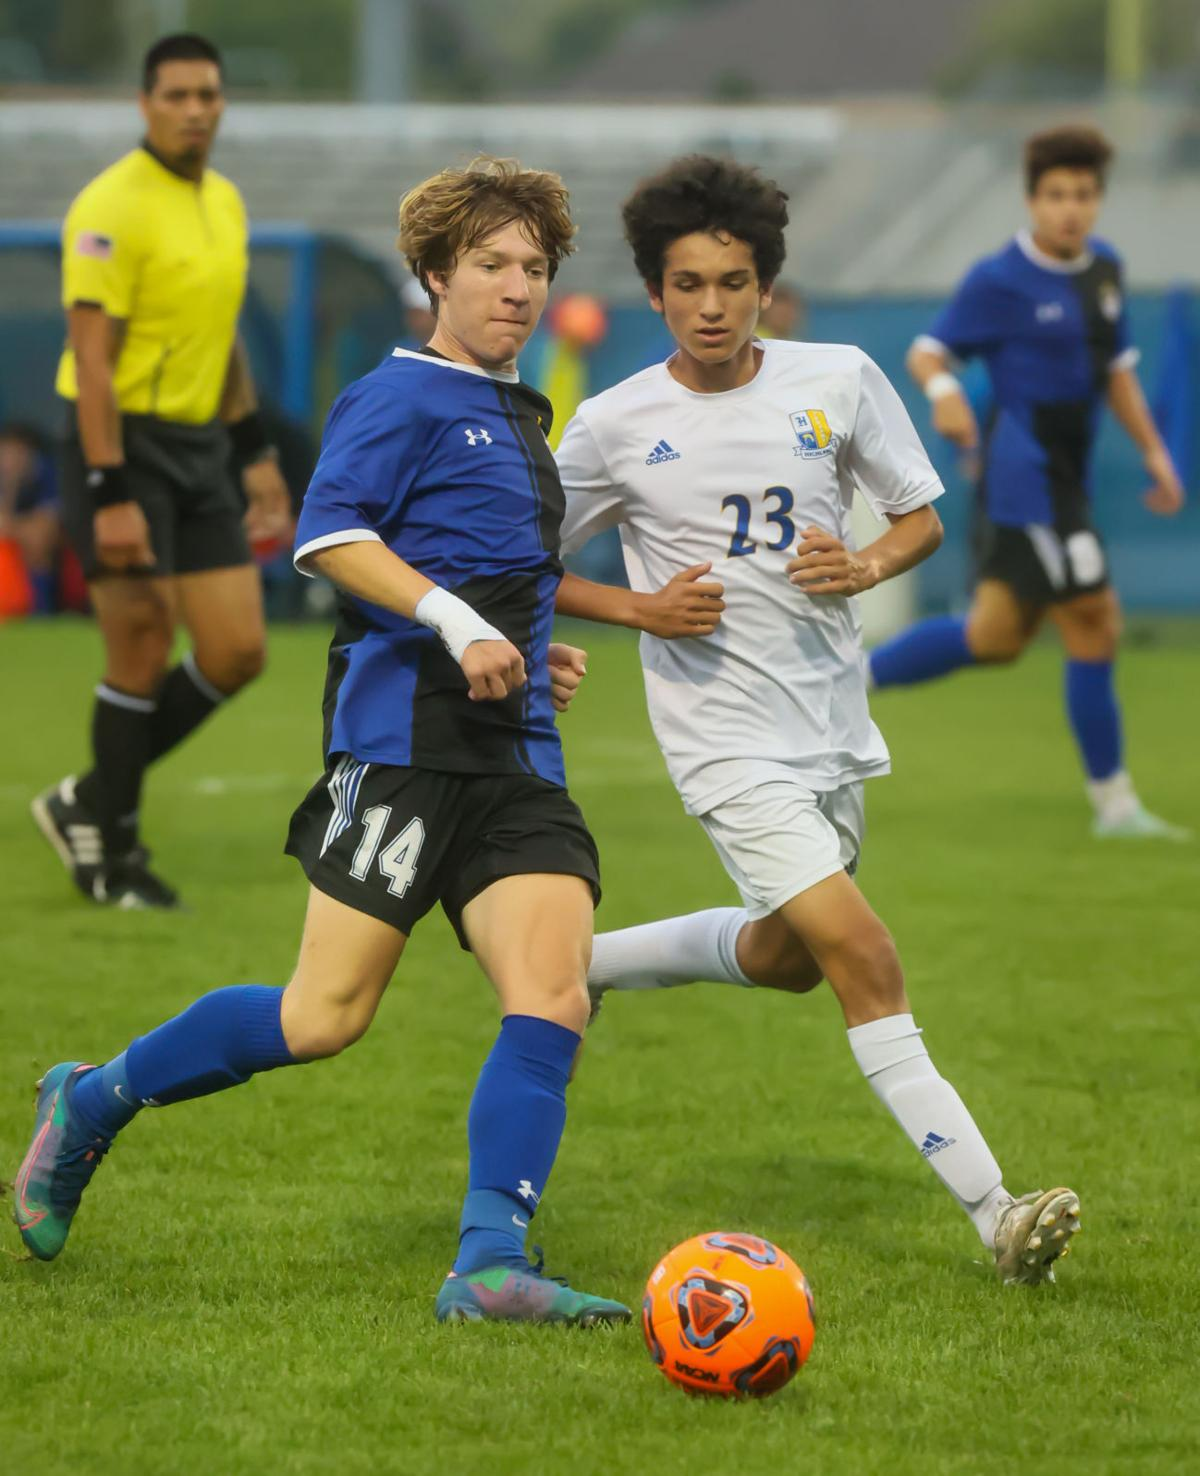 Highland vs Lake Central soccer sectional semifinal